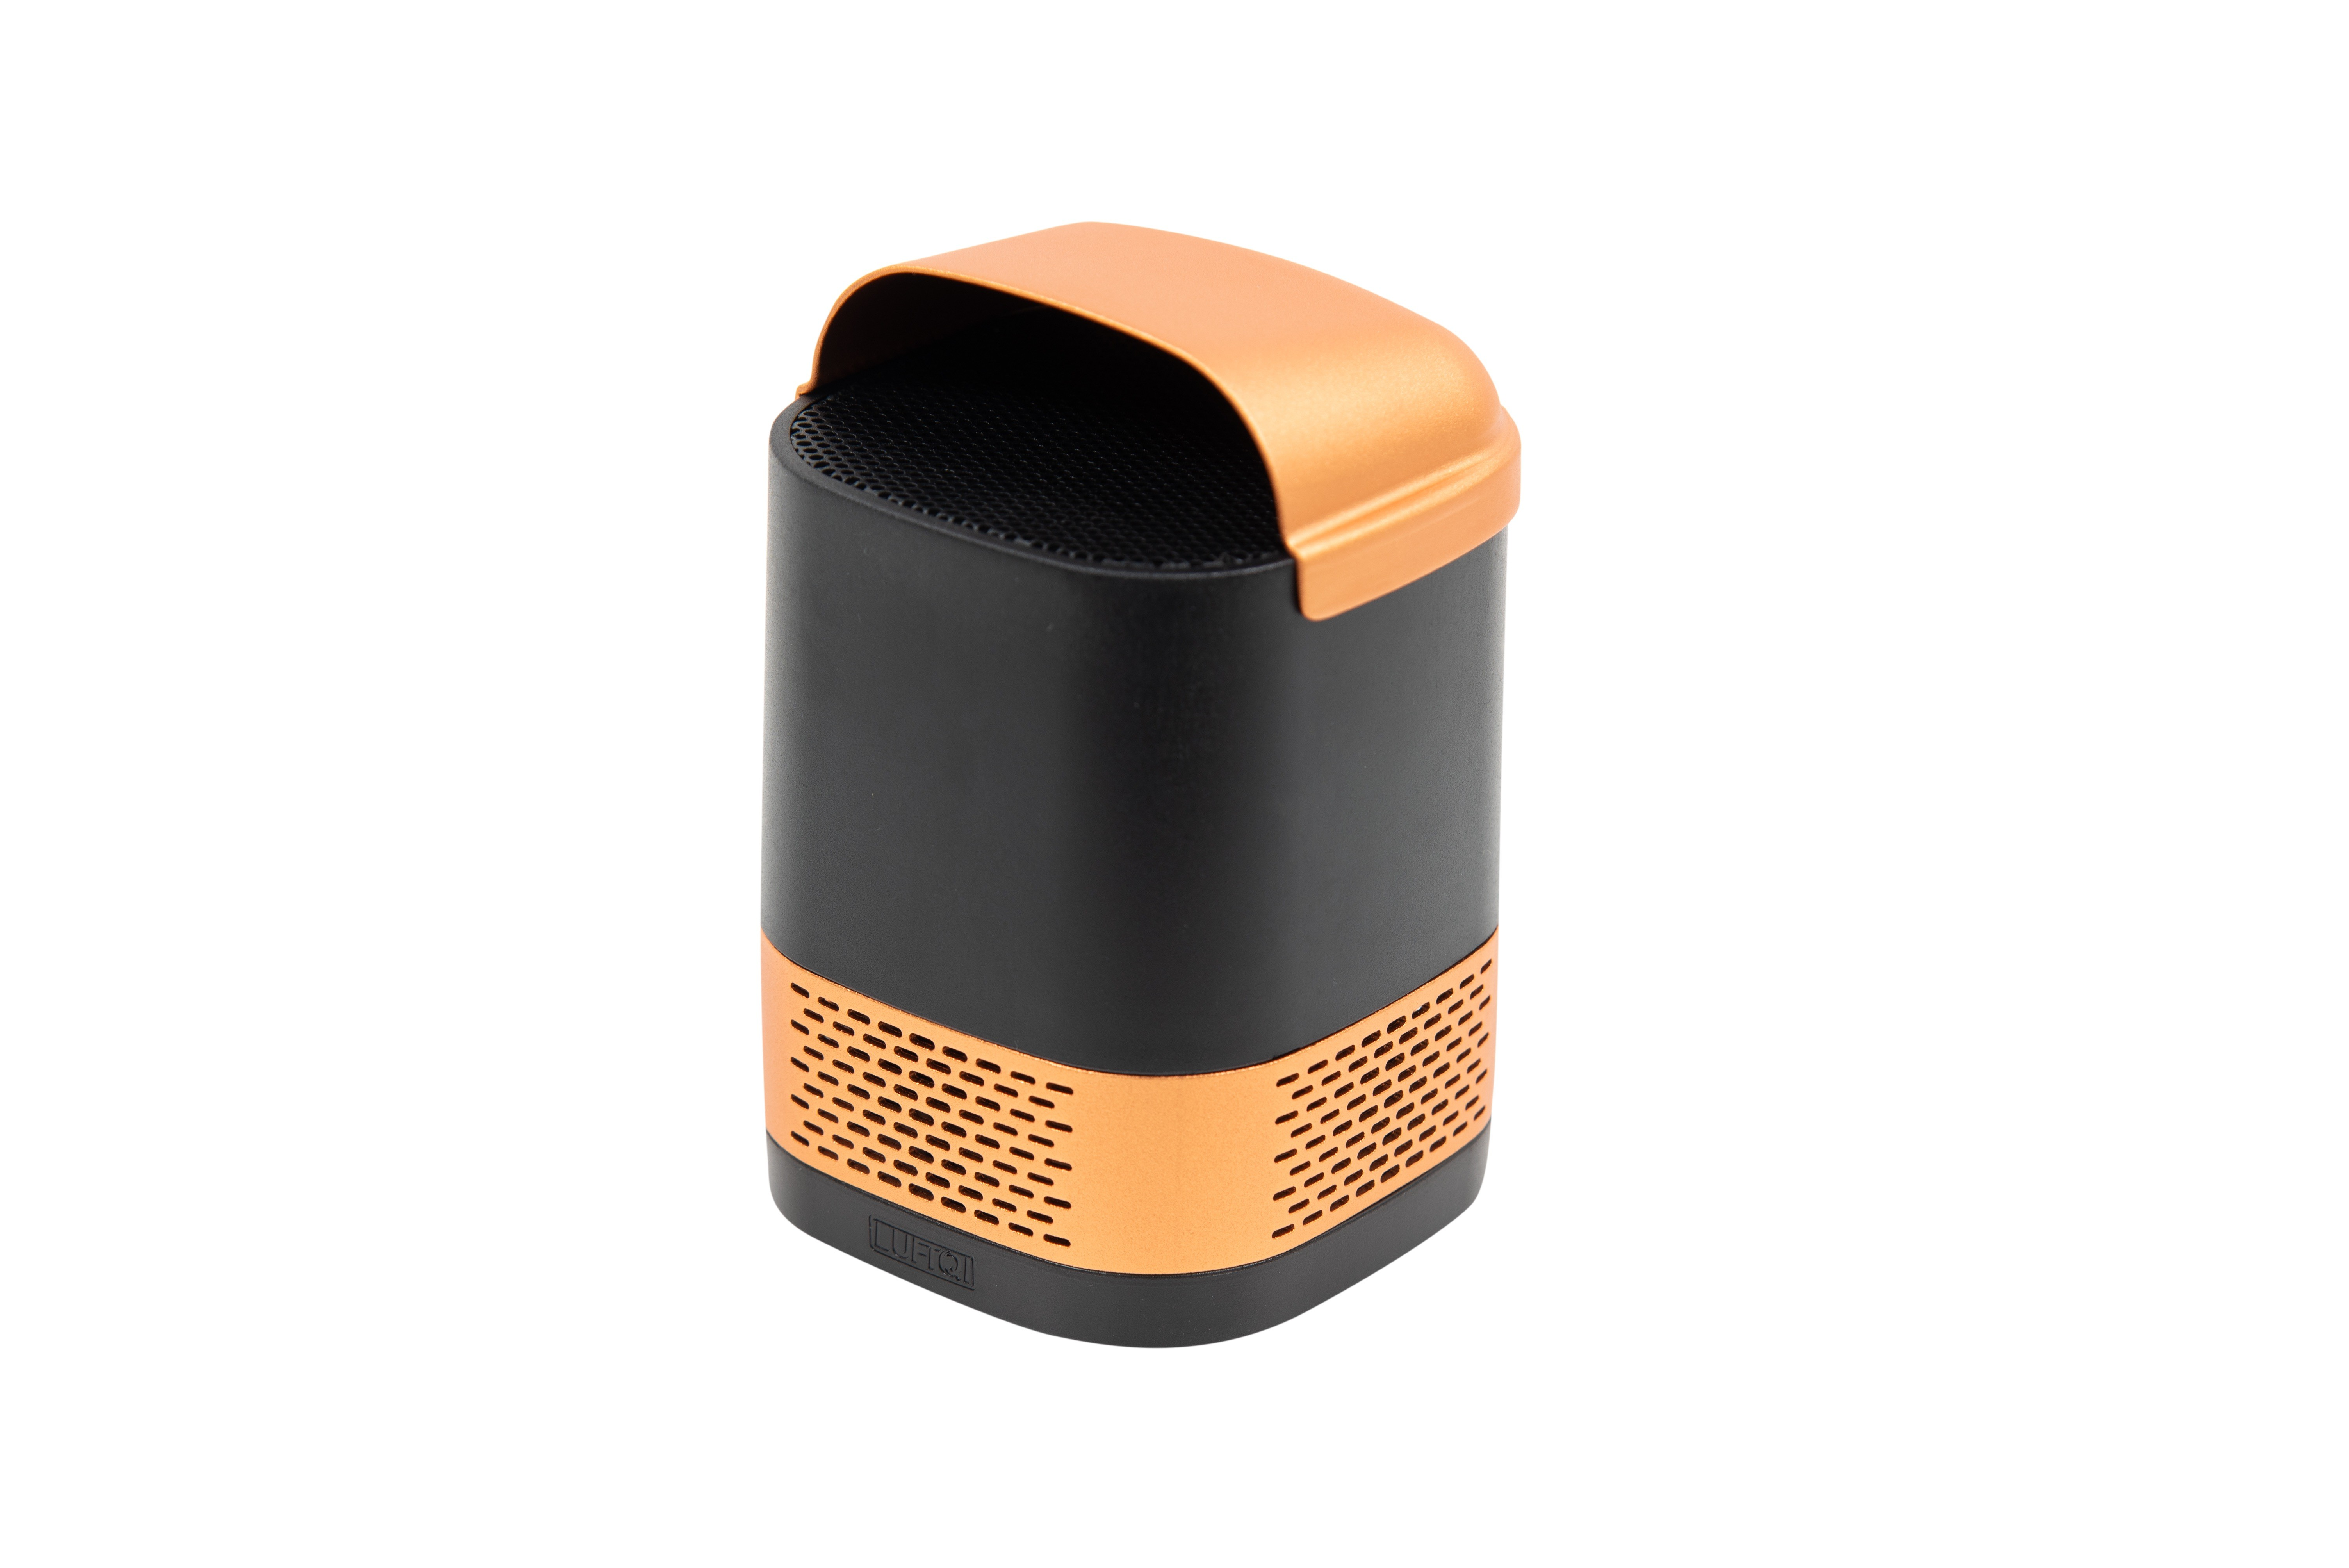 Filter-Fress Personal Air Purifier